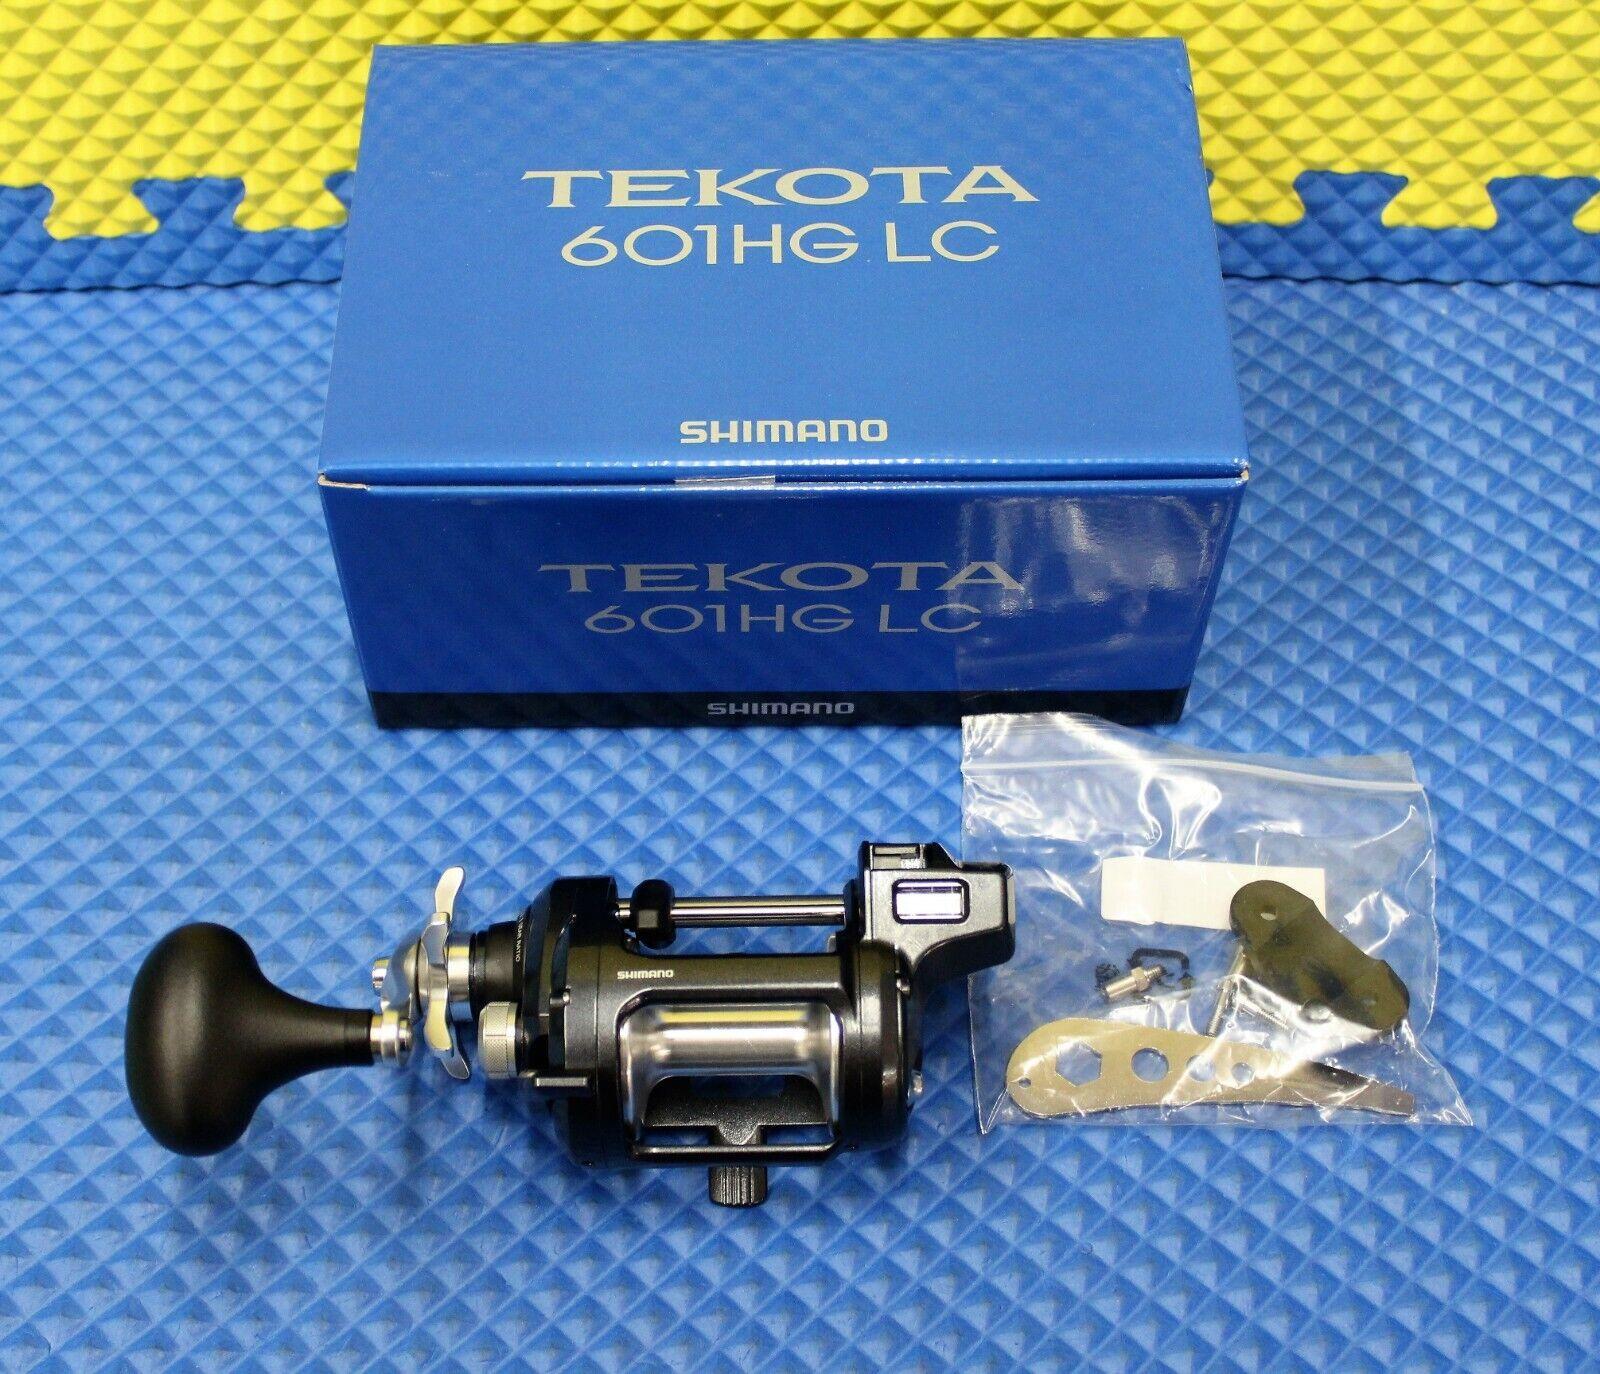 Shimano Tekota Left  Handed Linecounter Trolling Reel NEW FOR 2019  TEK601HGLCA  supply quality product